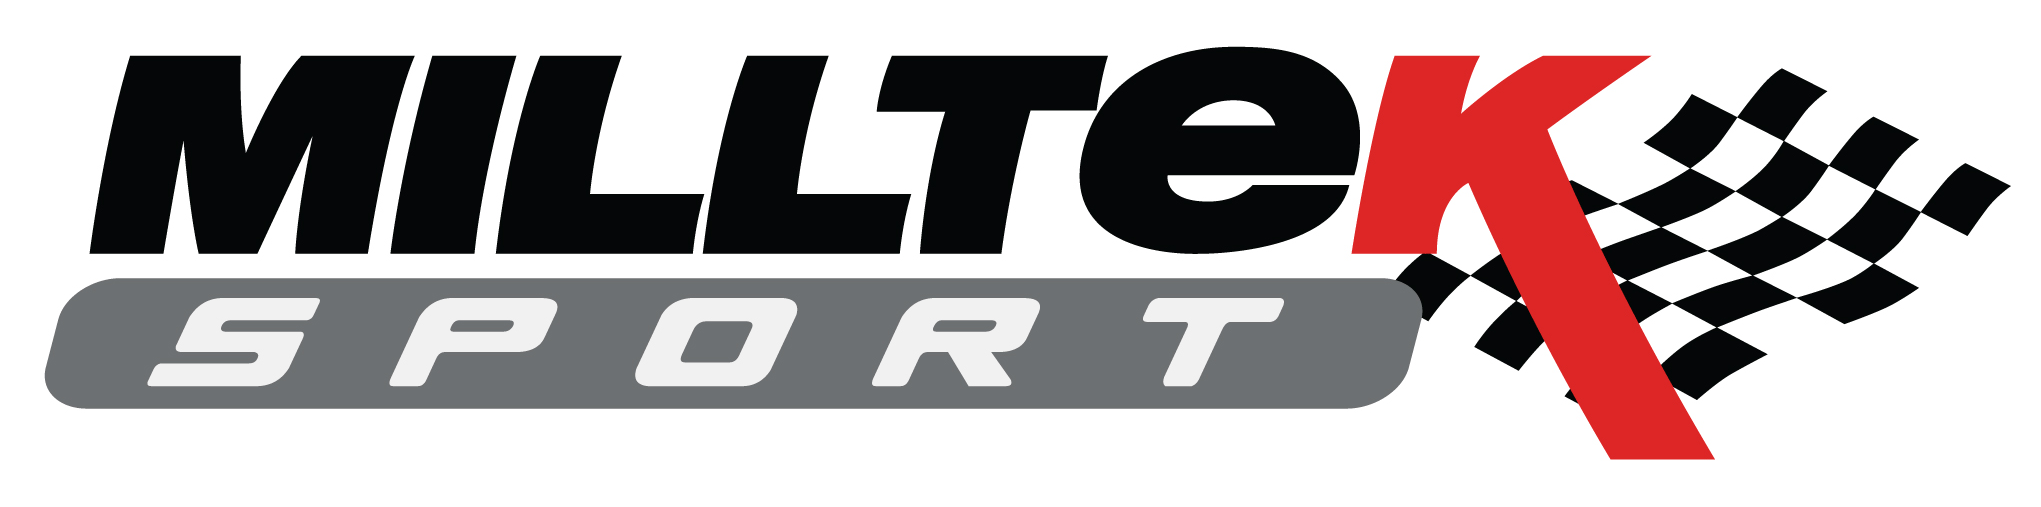 milltek.logo_.white_large